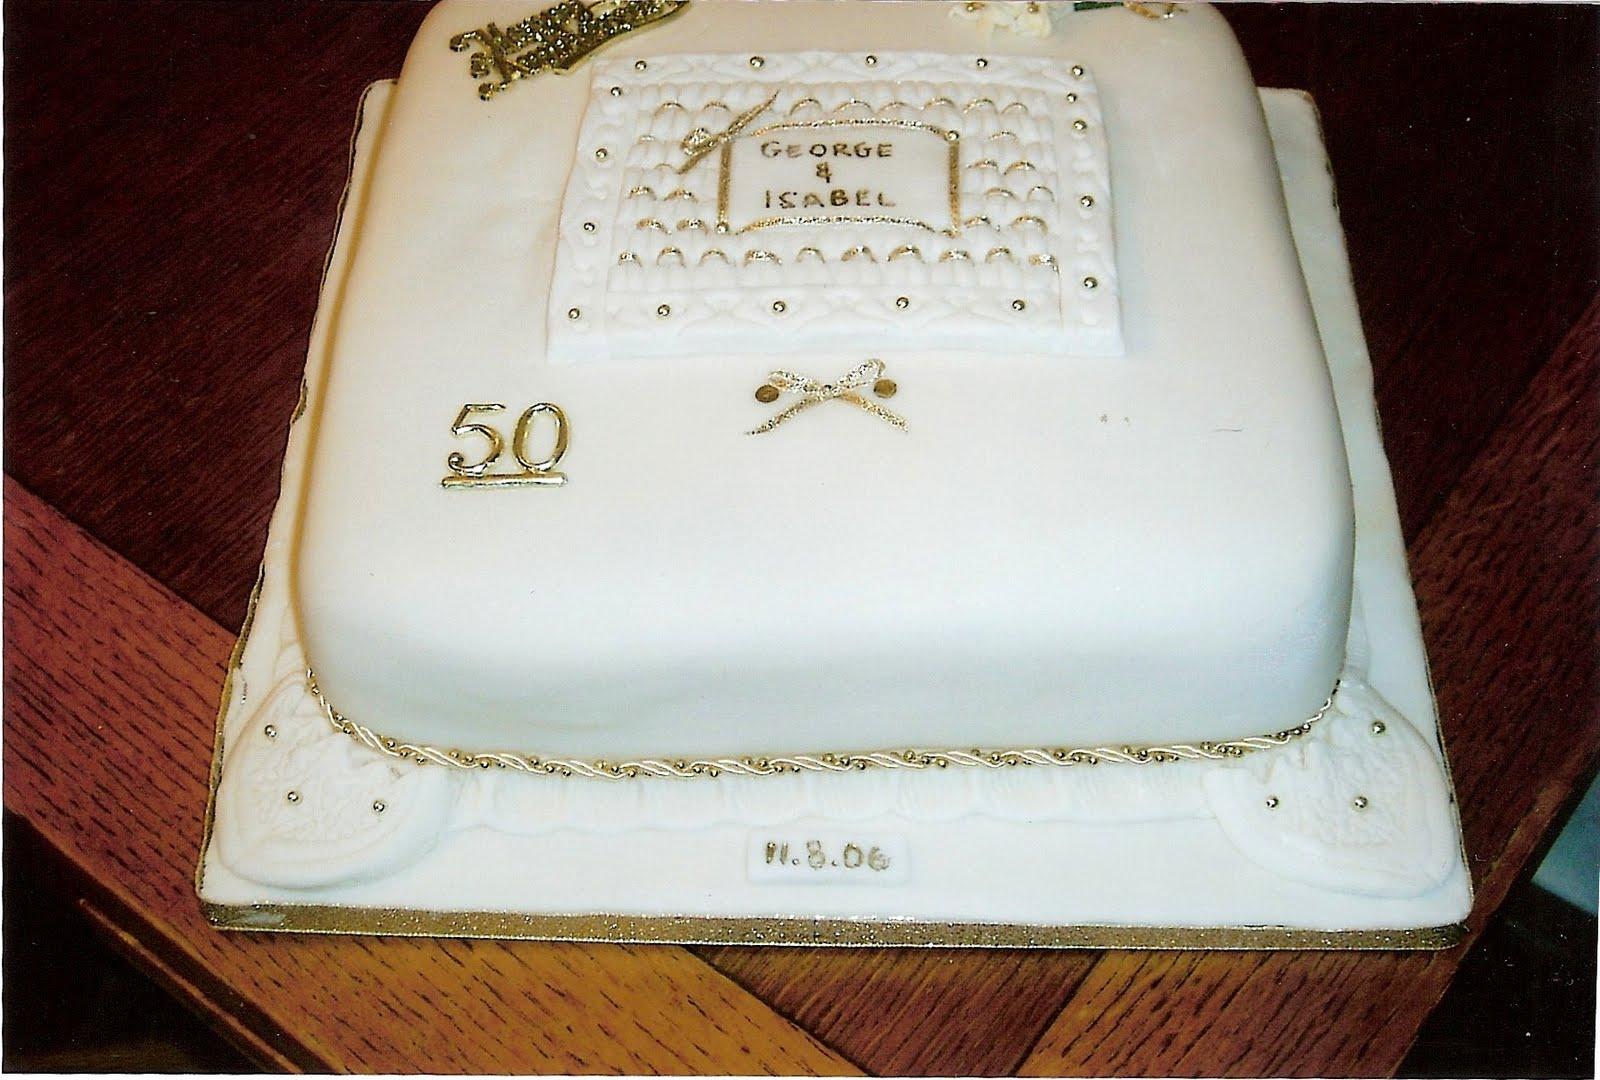 Cake Decorating: Golden Wedding cakes (August 2006)